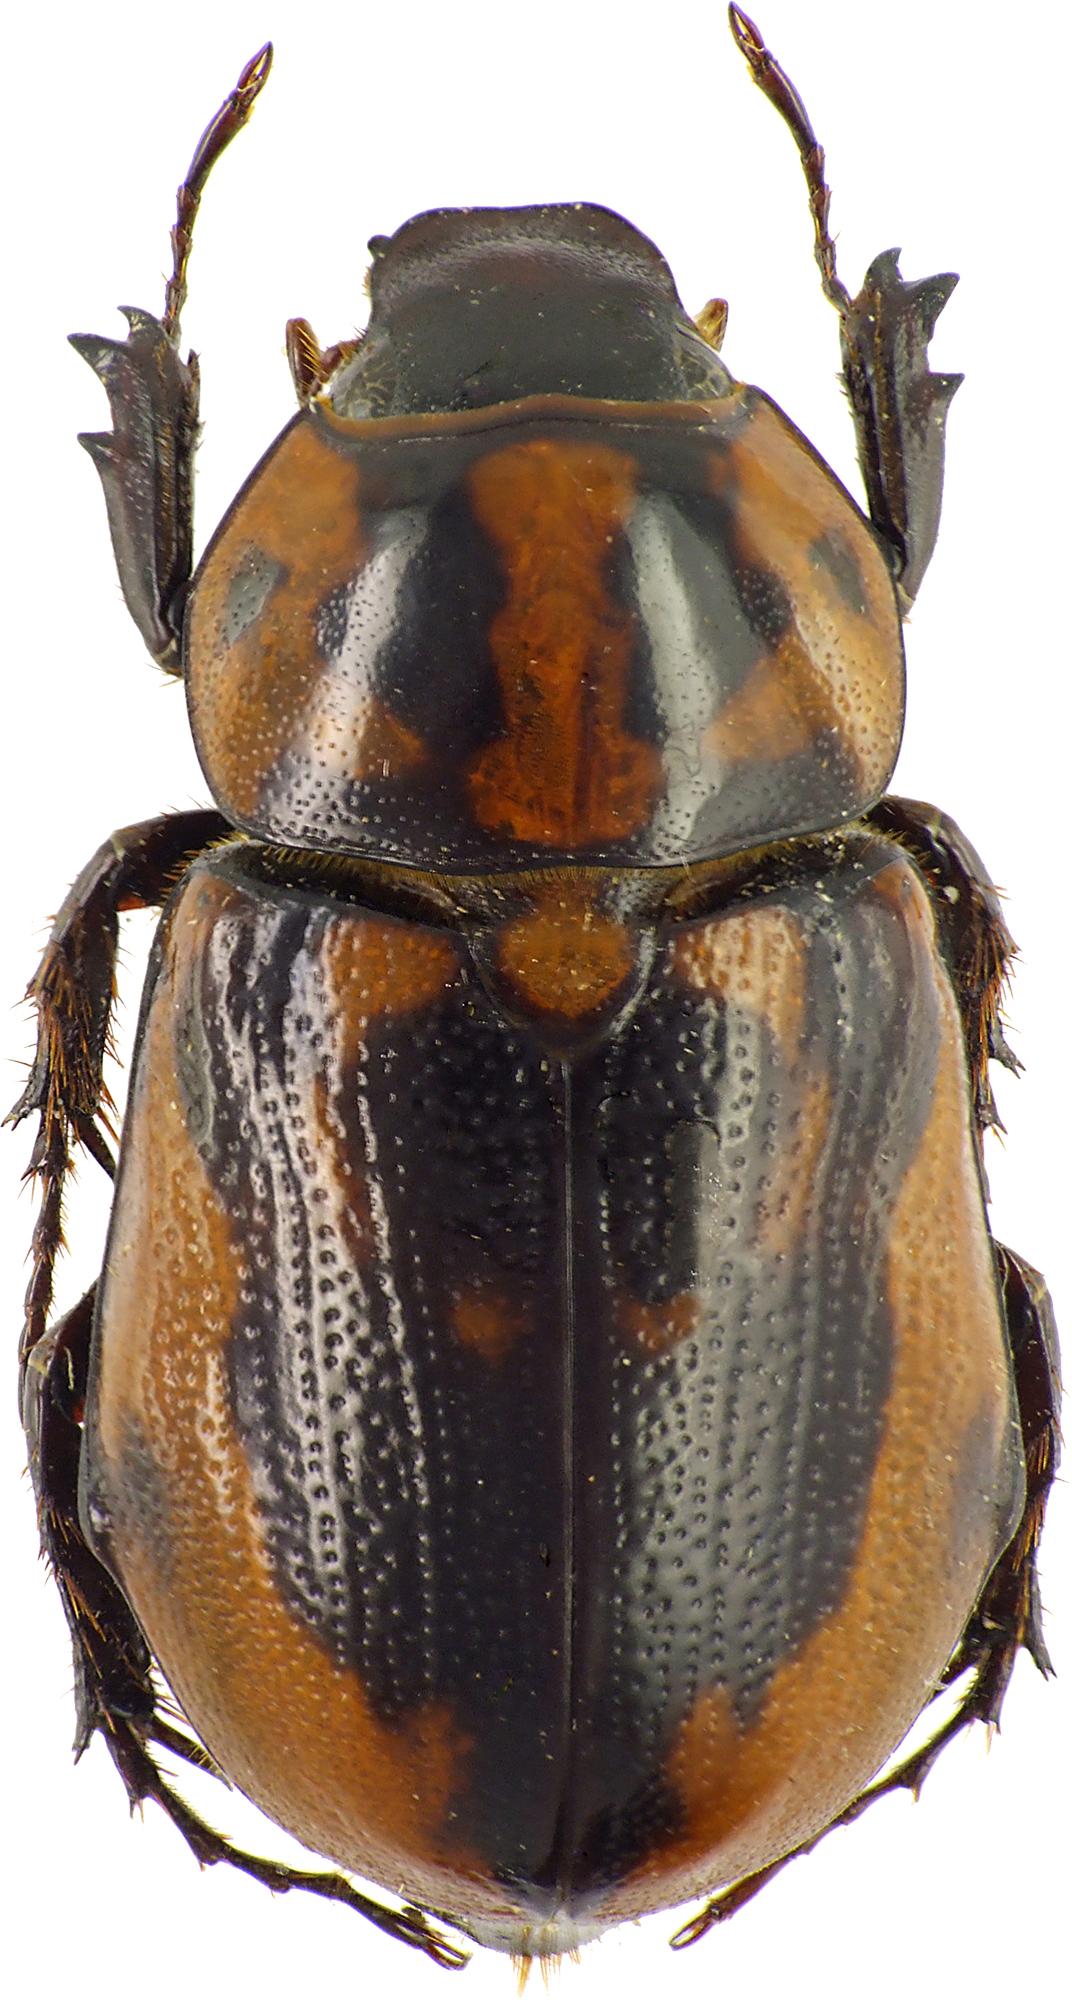 Cyclocephala deceptor 37257cz63.jpg